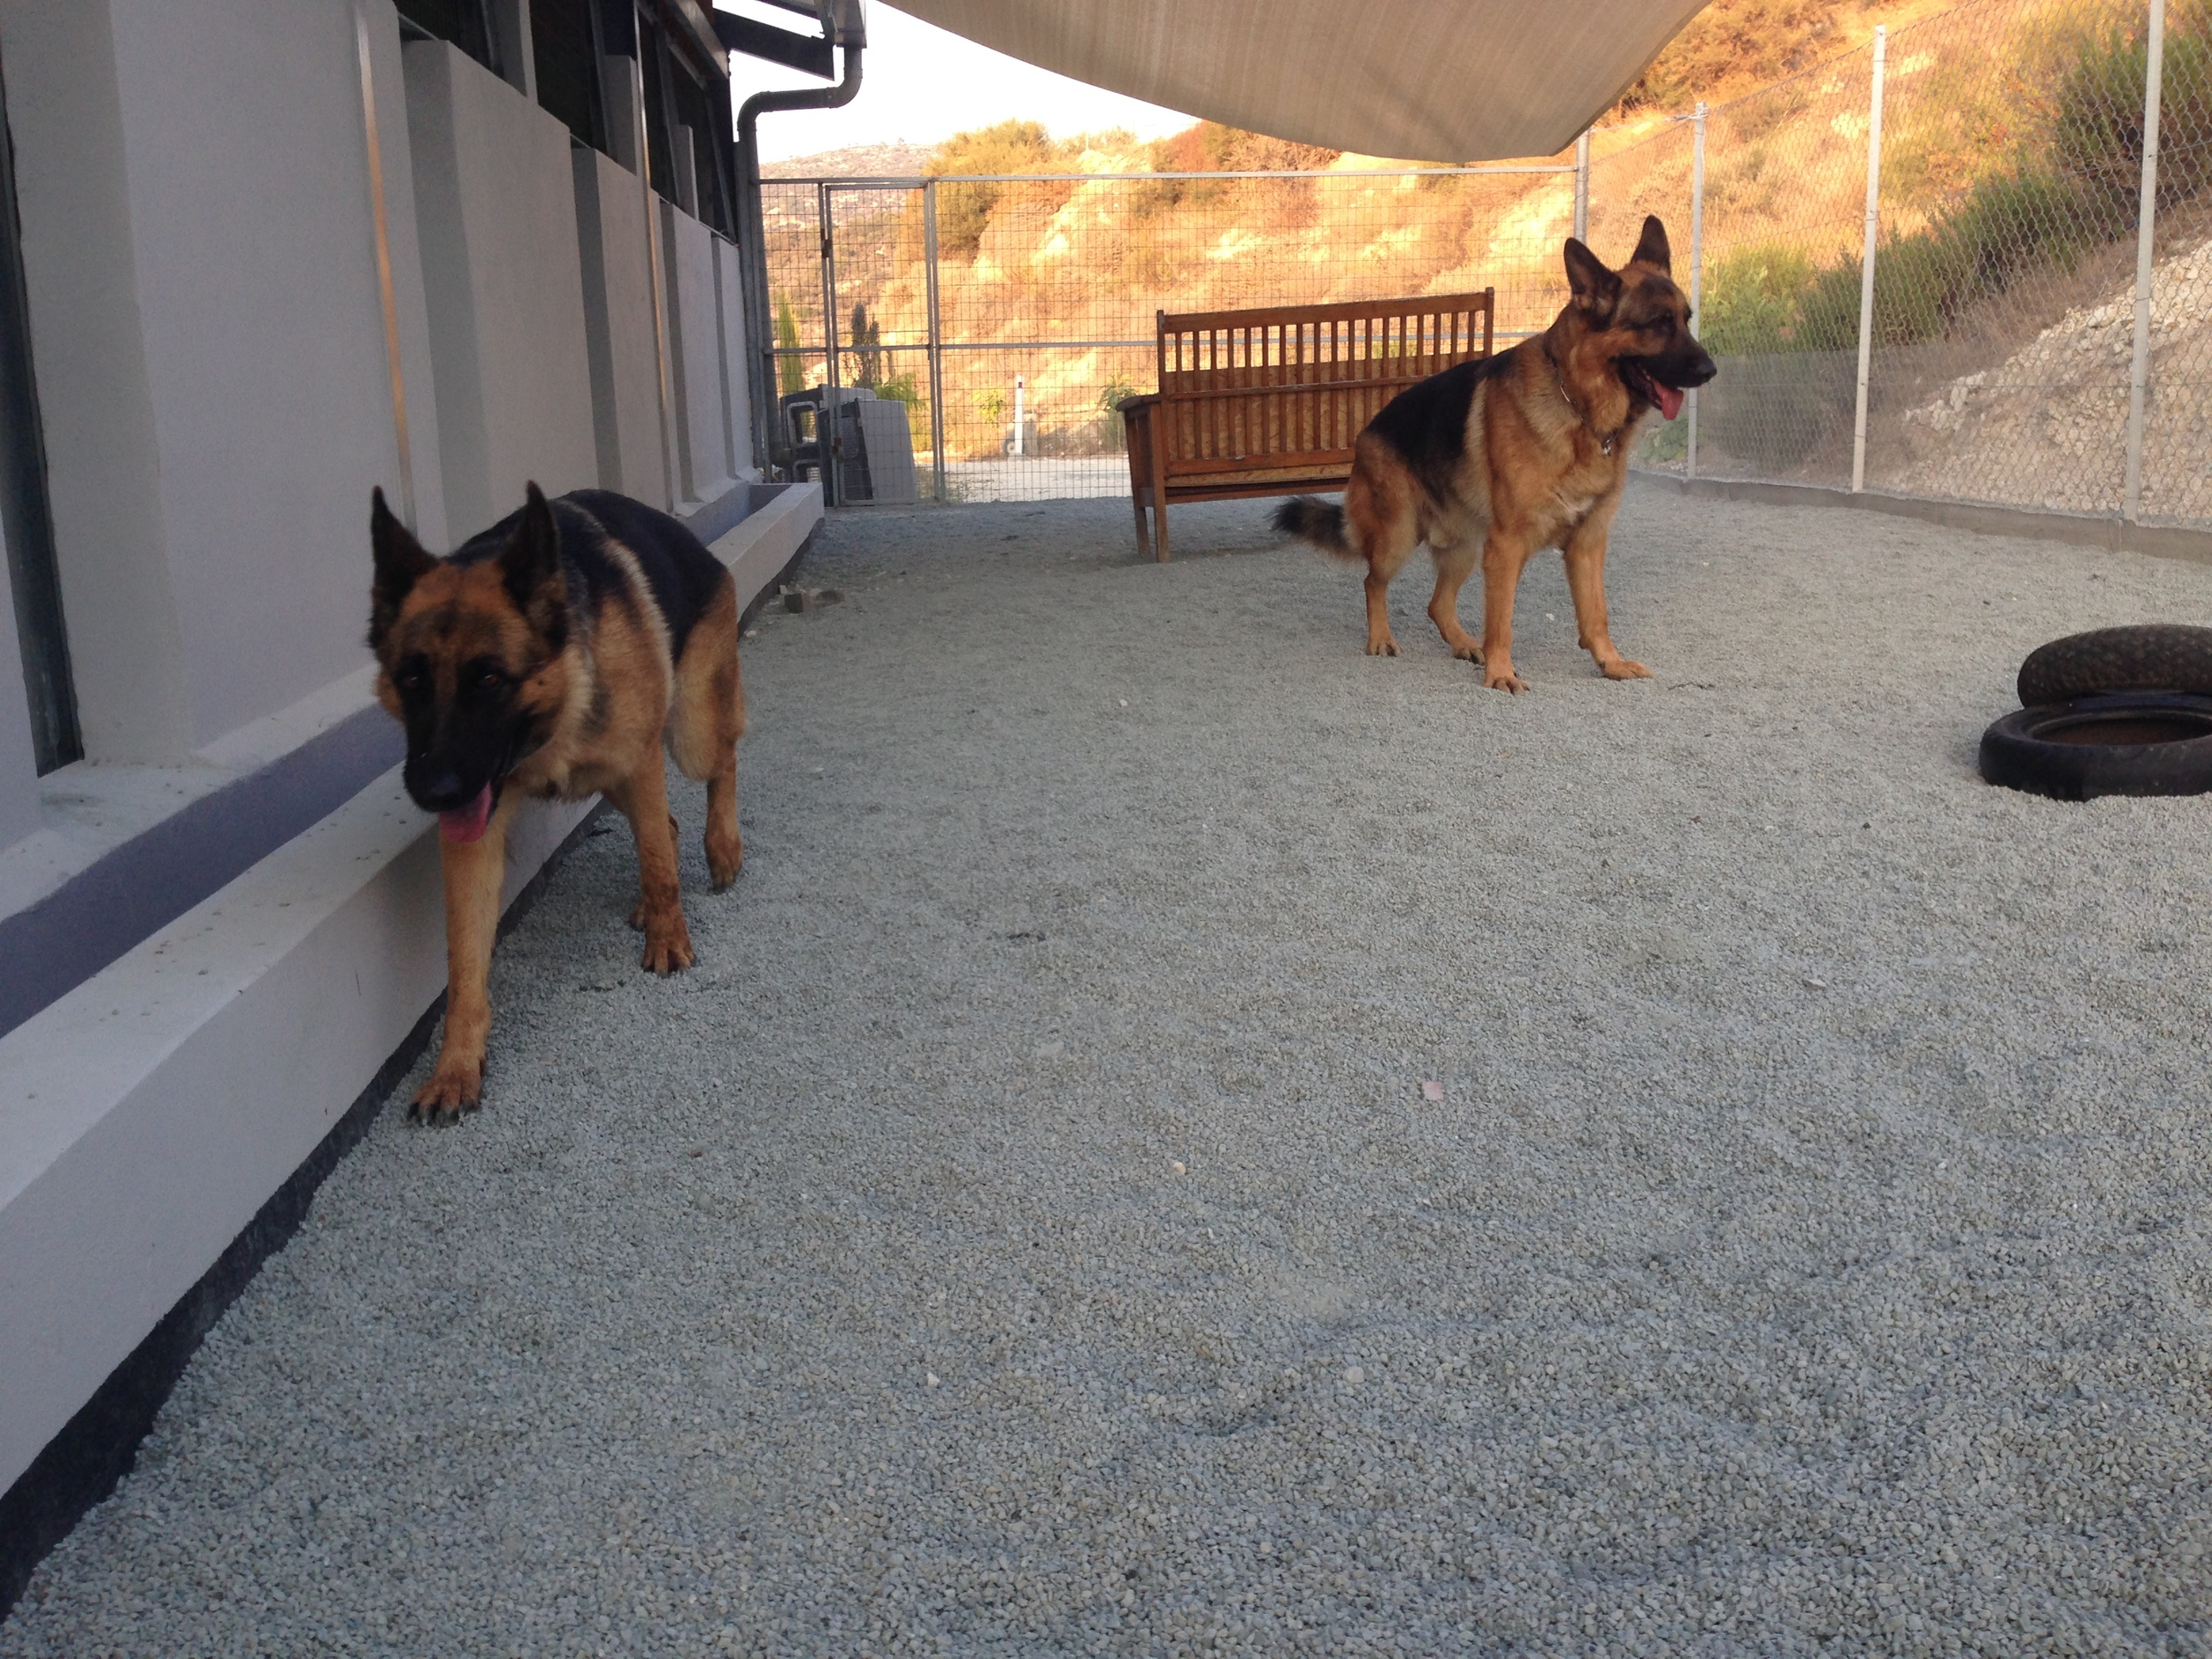 dog_ranch_dog_hotel_cyprus_limassol_brando&nelly.jpg